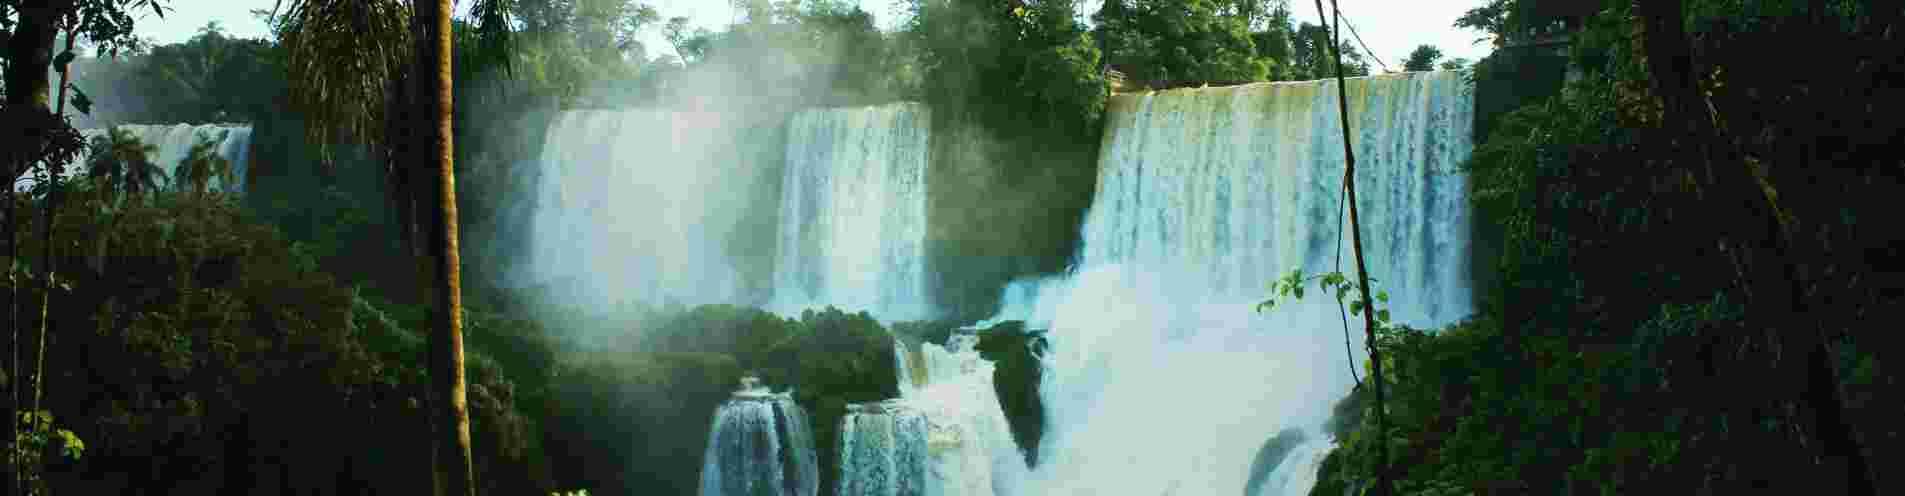 Top 5 adventure experiences in Victoria Falls header image